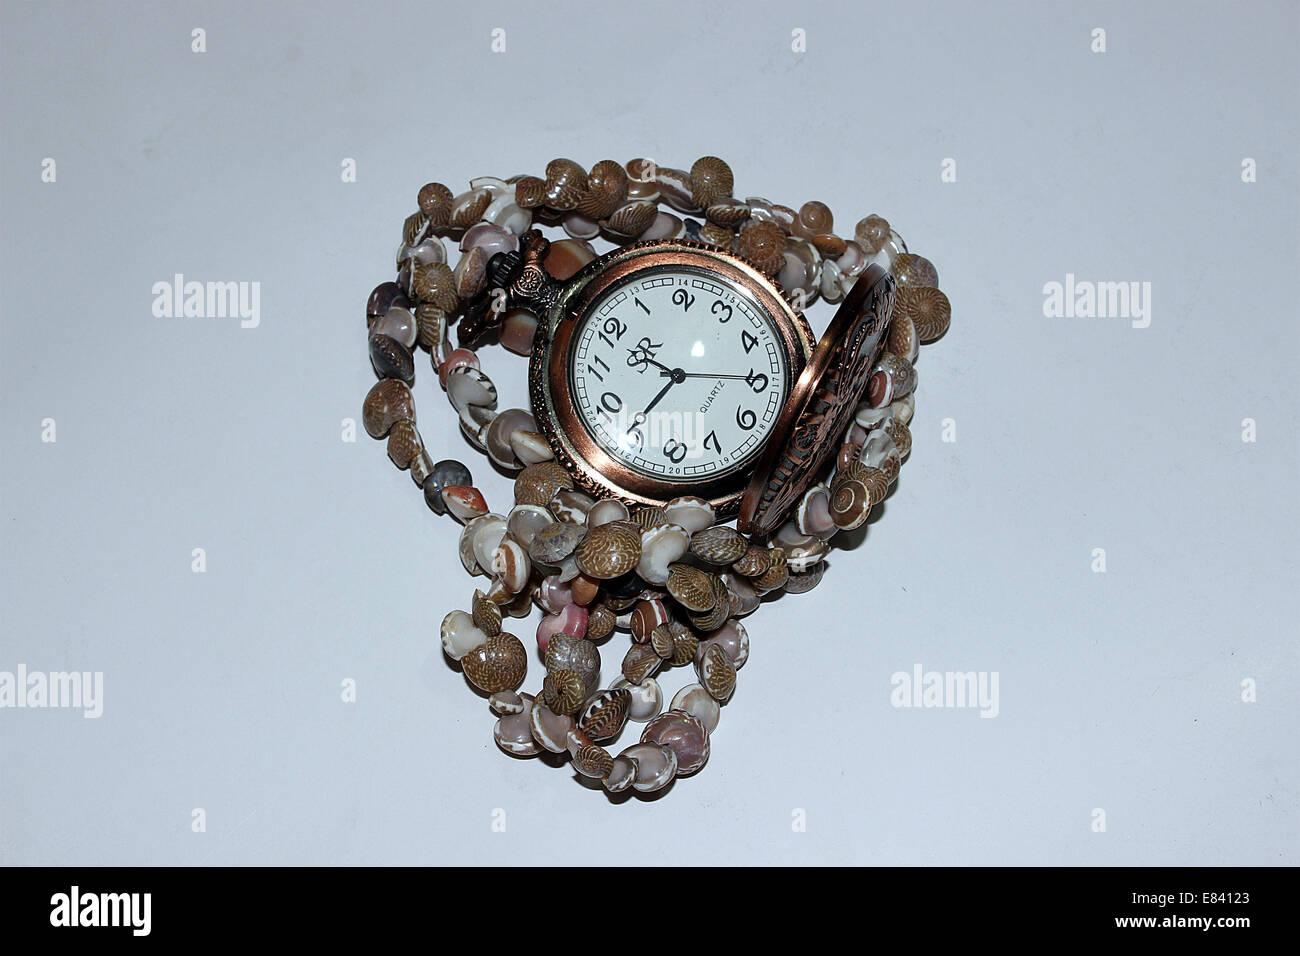 Watch,still-life,chronometer,artifact,beads,shells - Stock Image